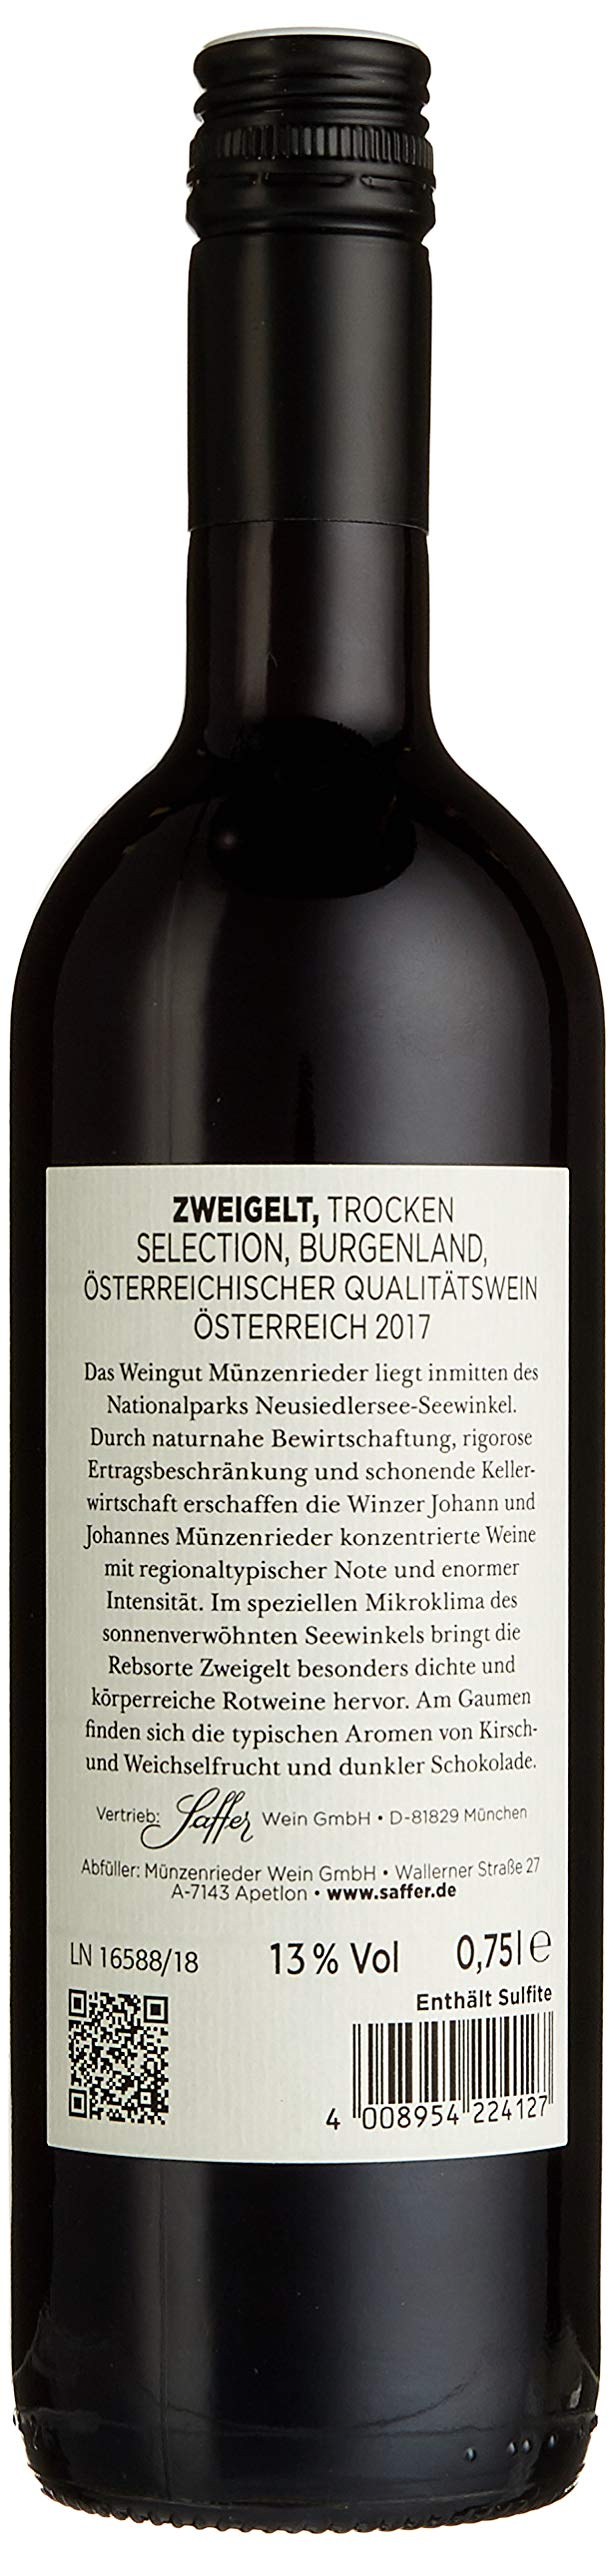 Zweigelt-QW-BurgenlandSelection-trocken-6-x-075-l